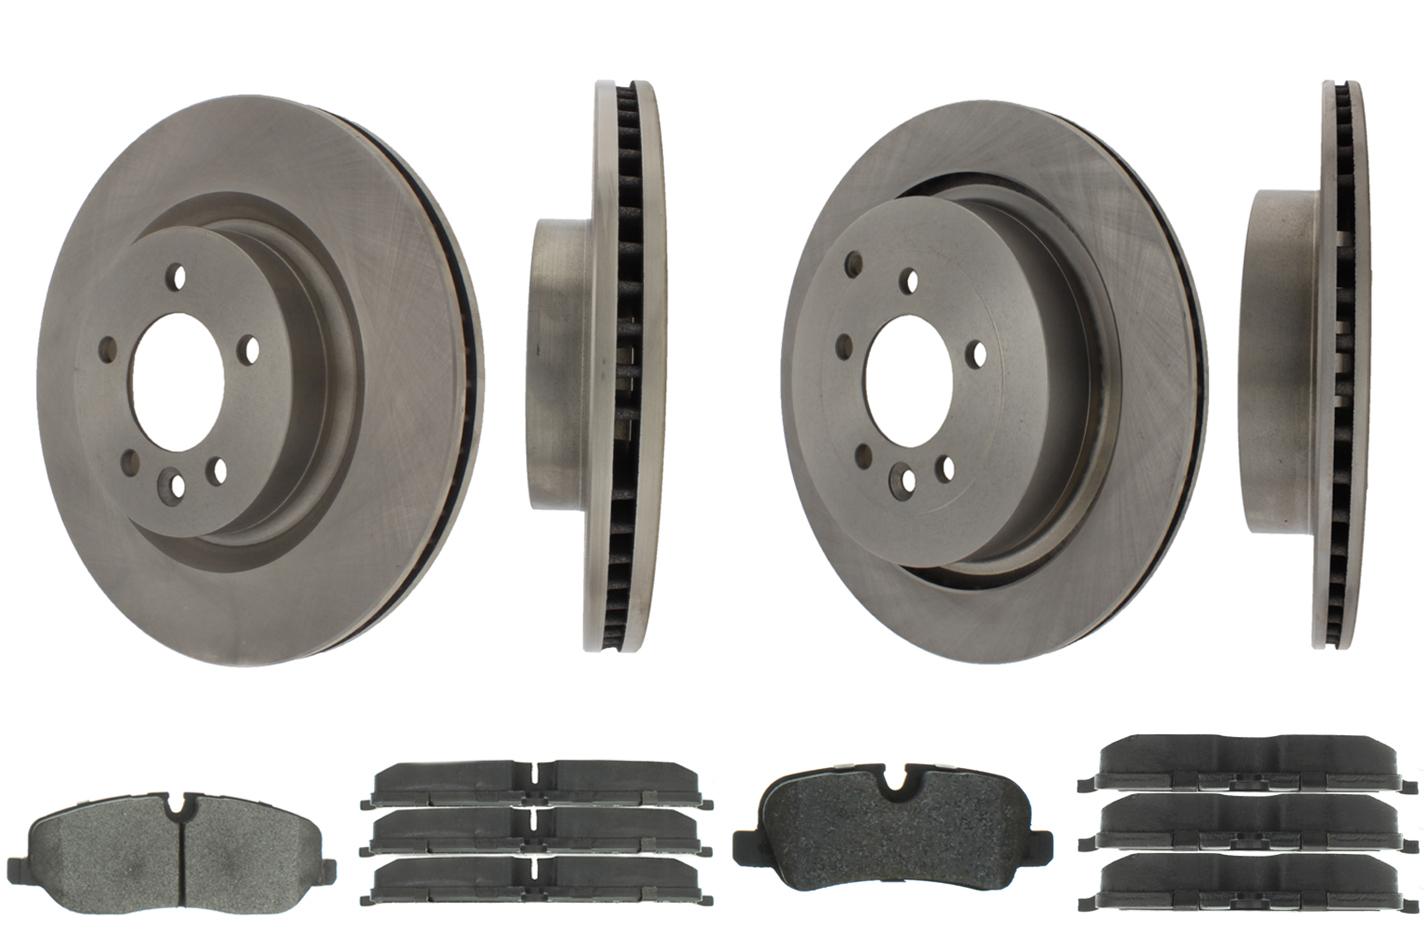 Centric Brake Parts 905.22003 Brake Rotor and Pad Kit, Premium, Semi-Metallic Pads, Iron, Natural, Land Rover LR3 / Range Rover Sport 2005-09, Kit